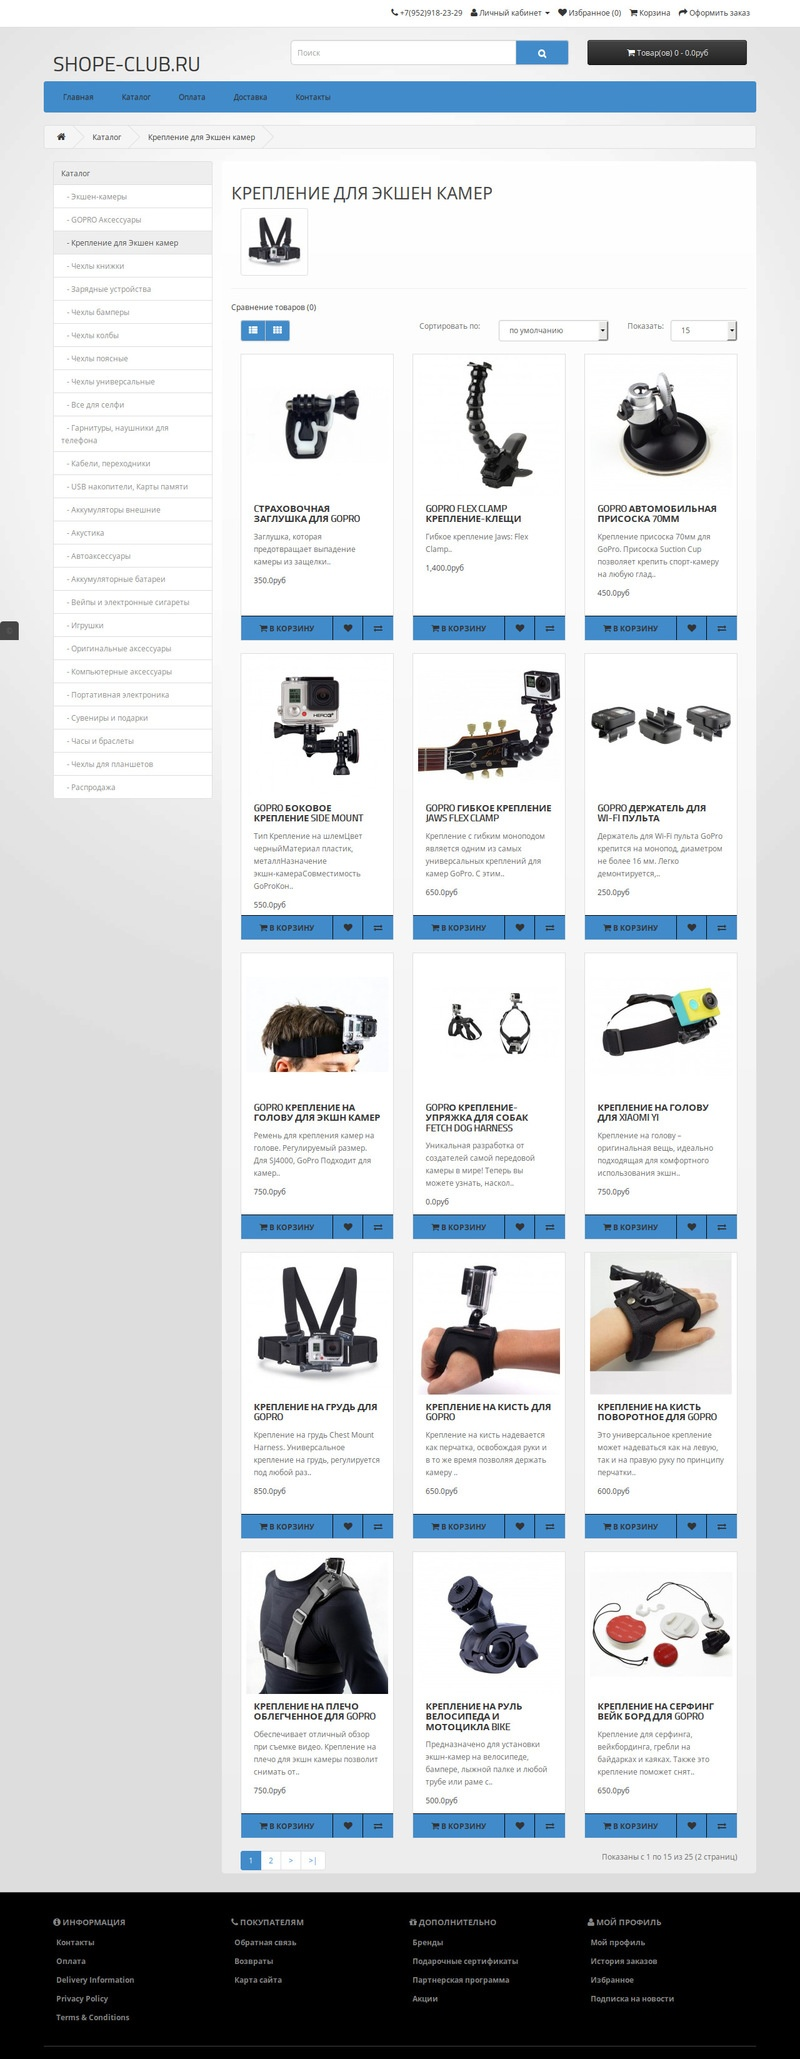 Создание интернет-магазина экшн камер